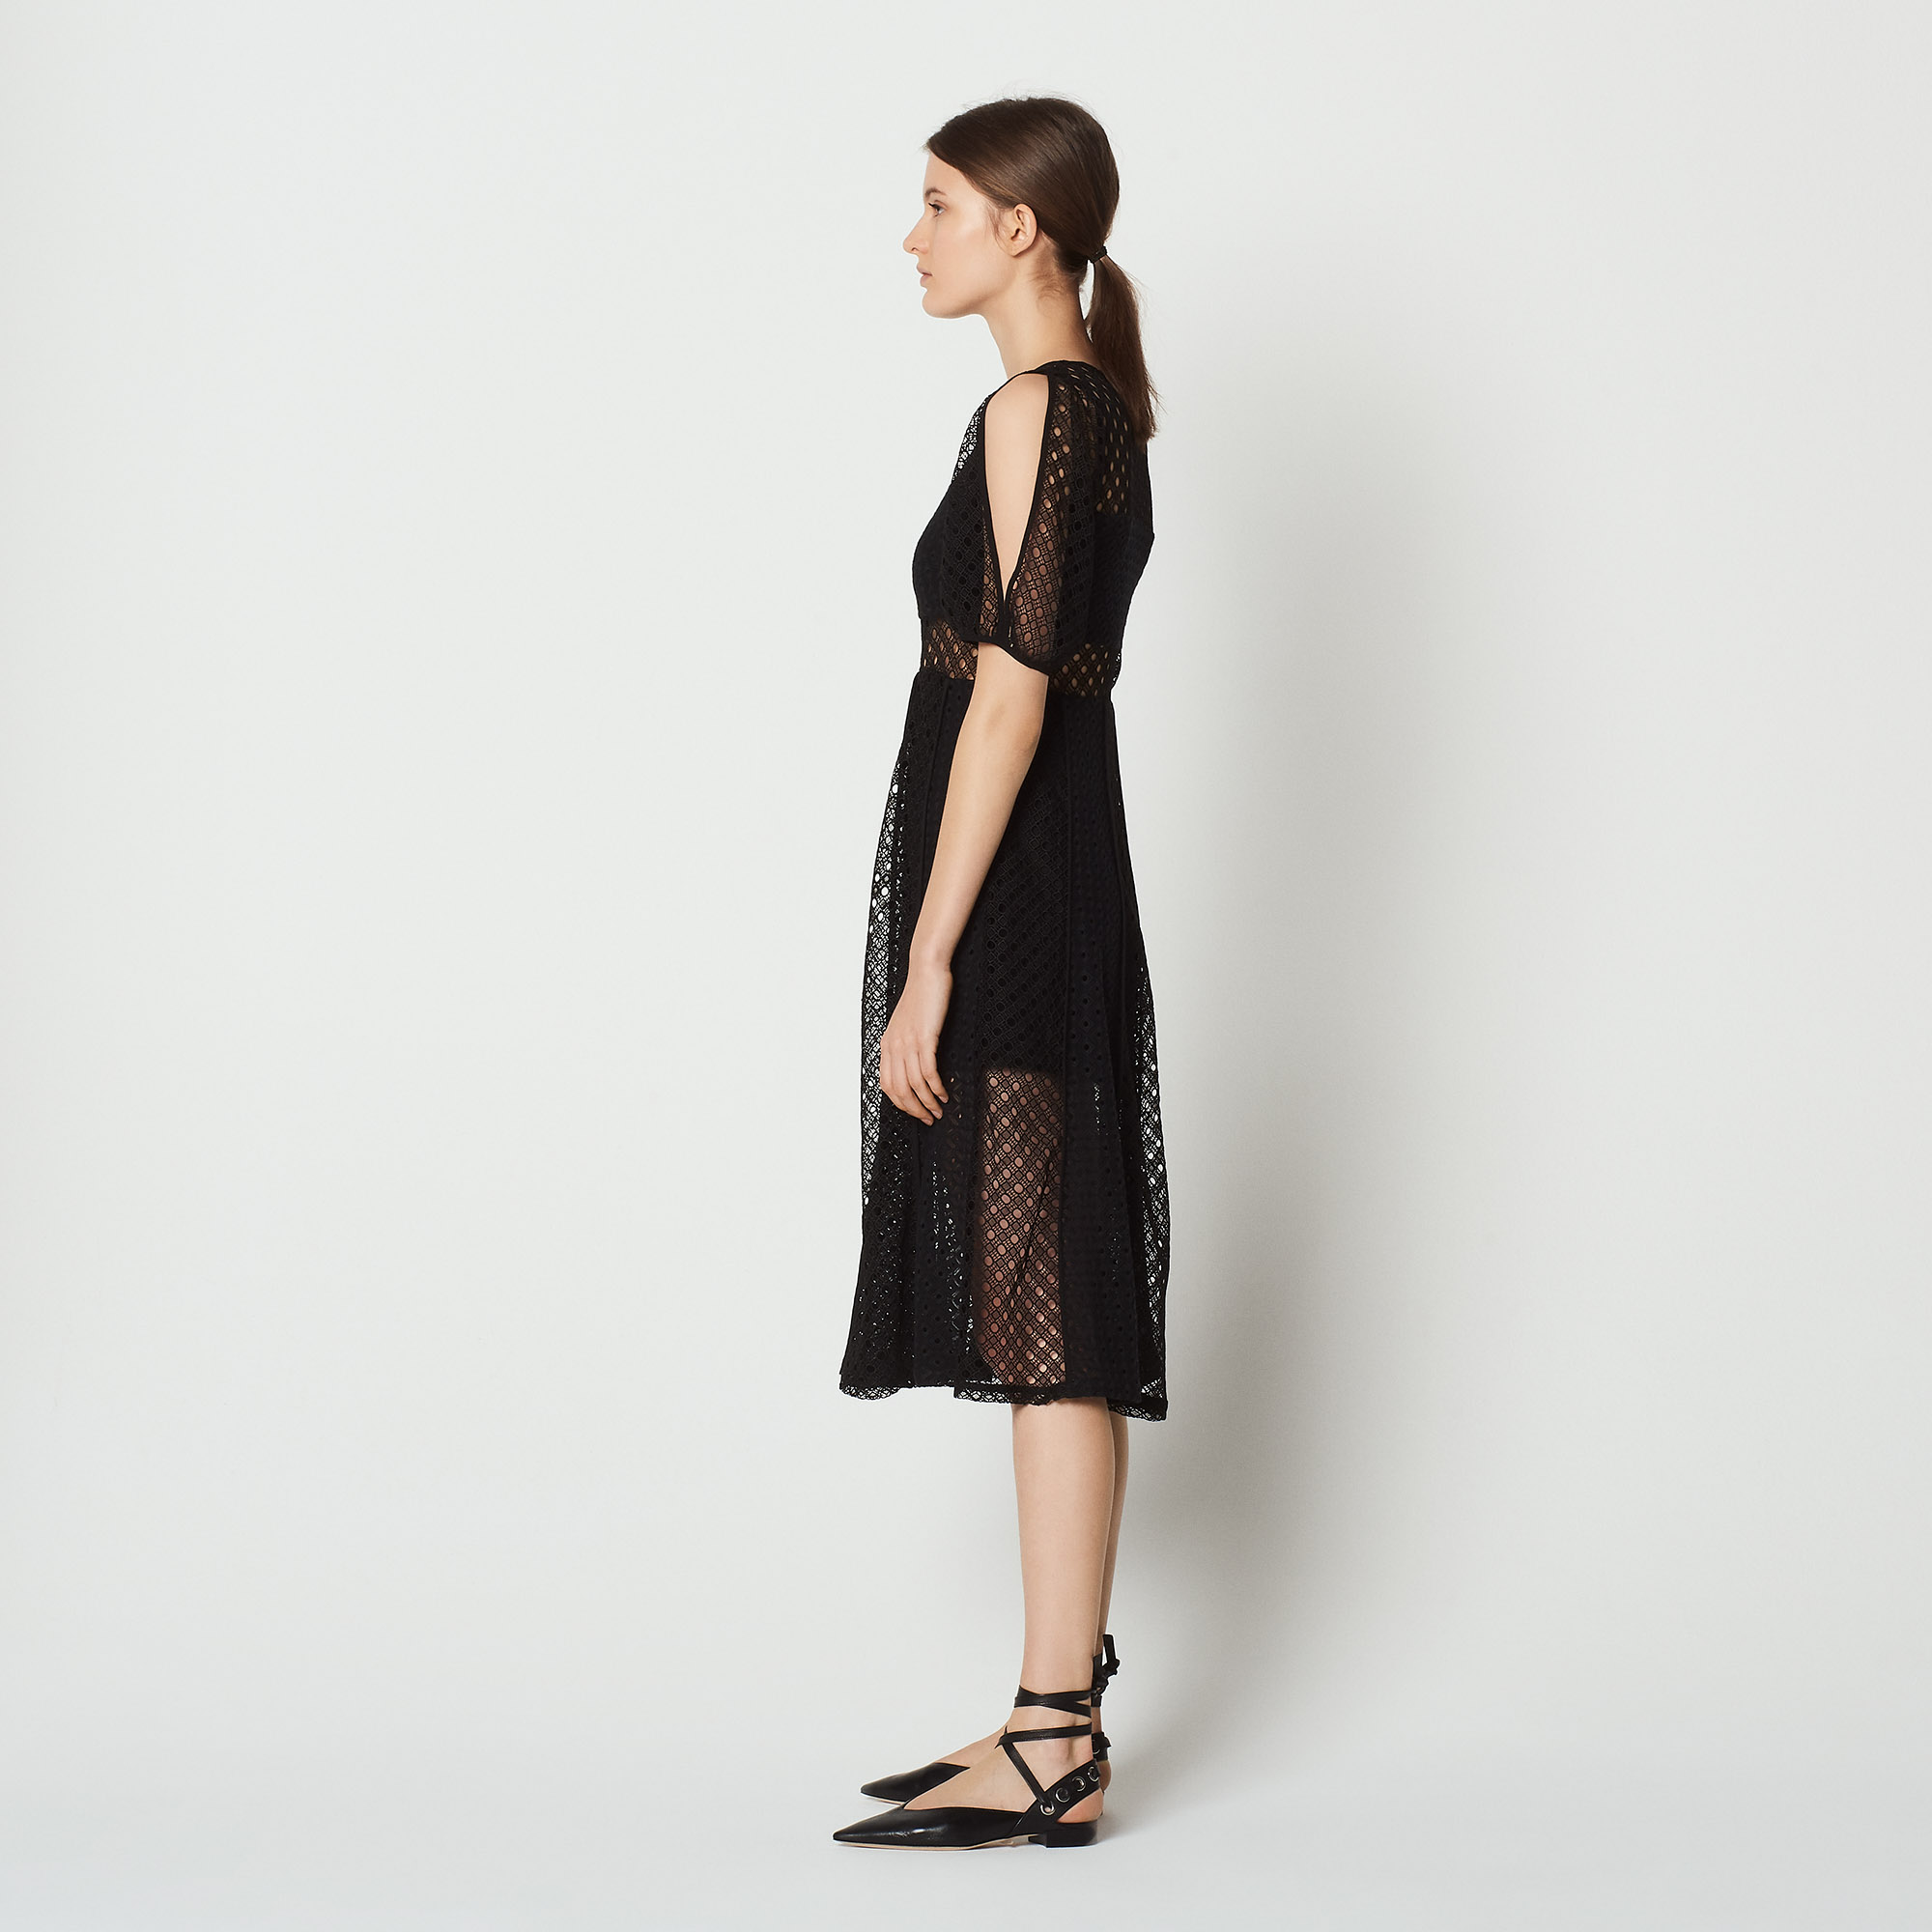 sandro MALIA - Robe longue - noir Vente Excellente gepZJmC